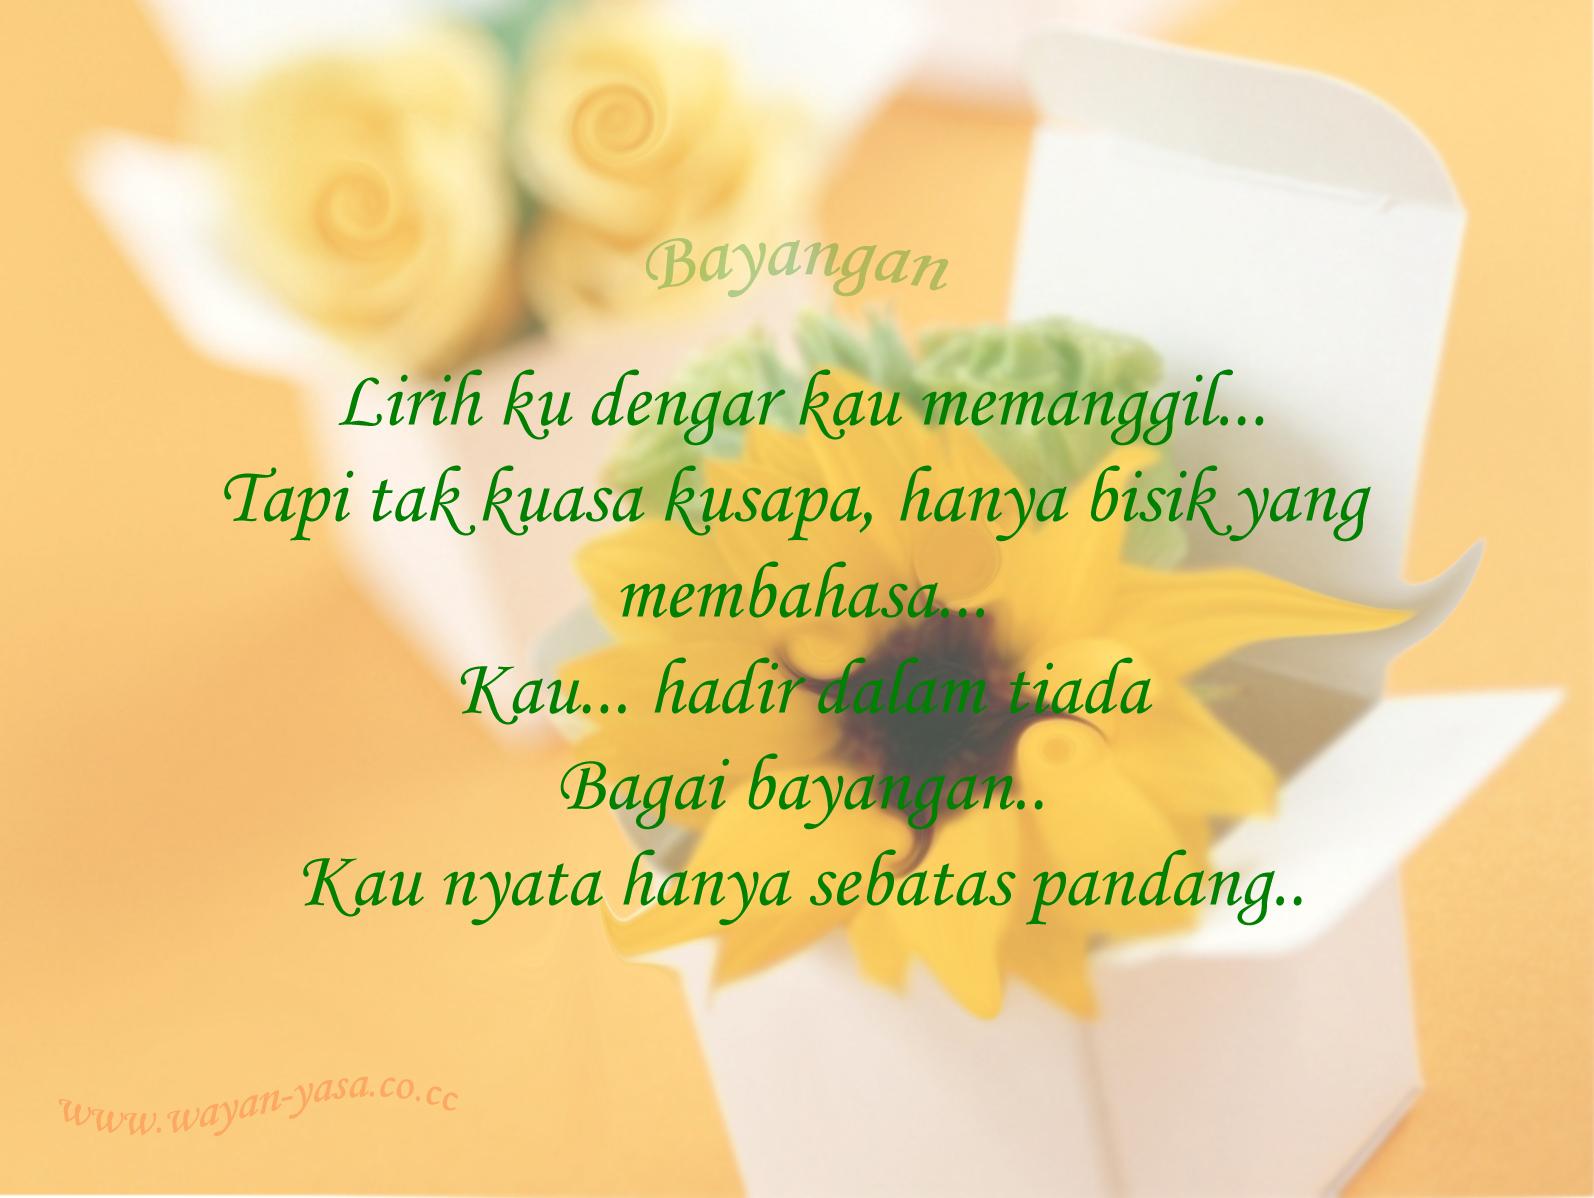 Selamat Datang di Blog Wayan Yasa